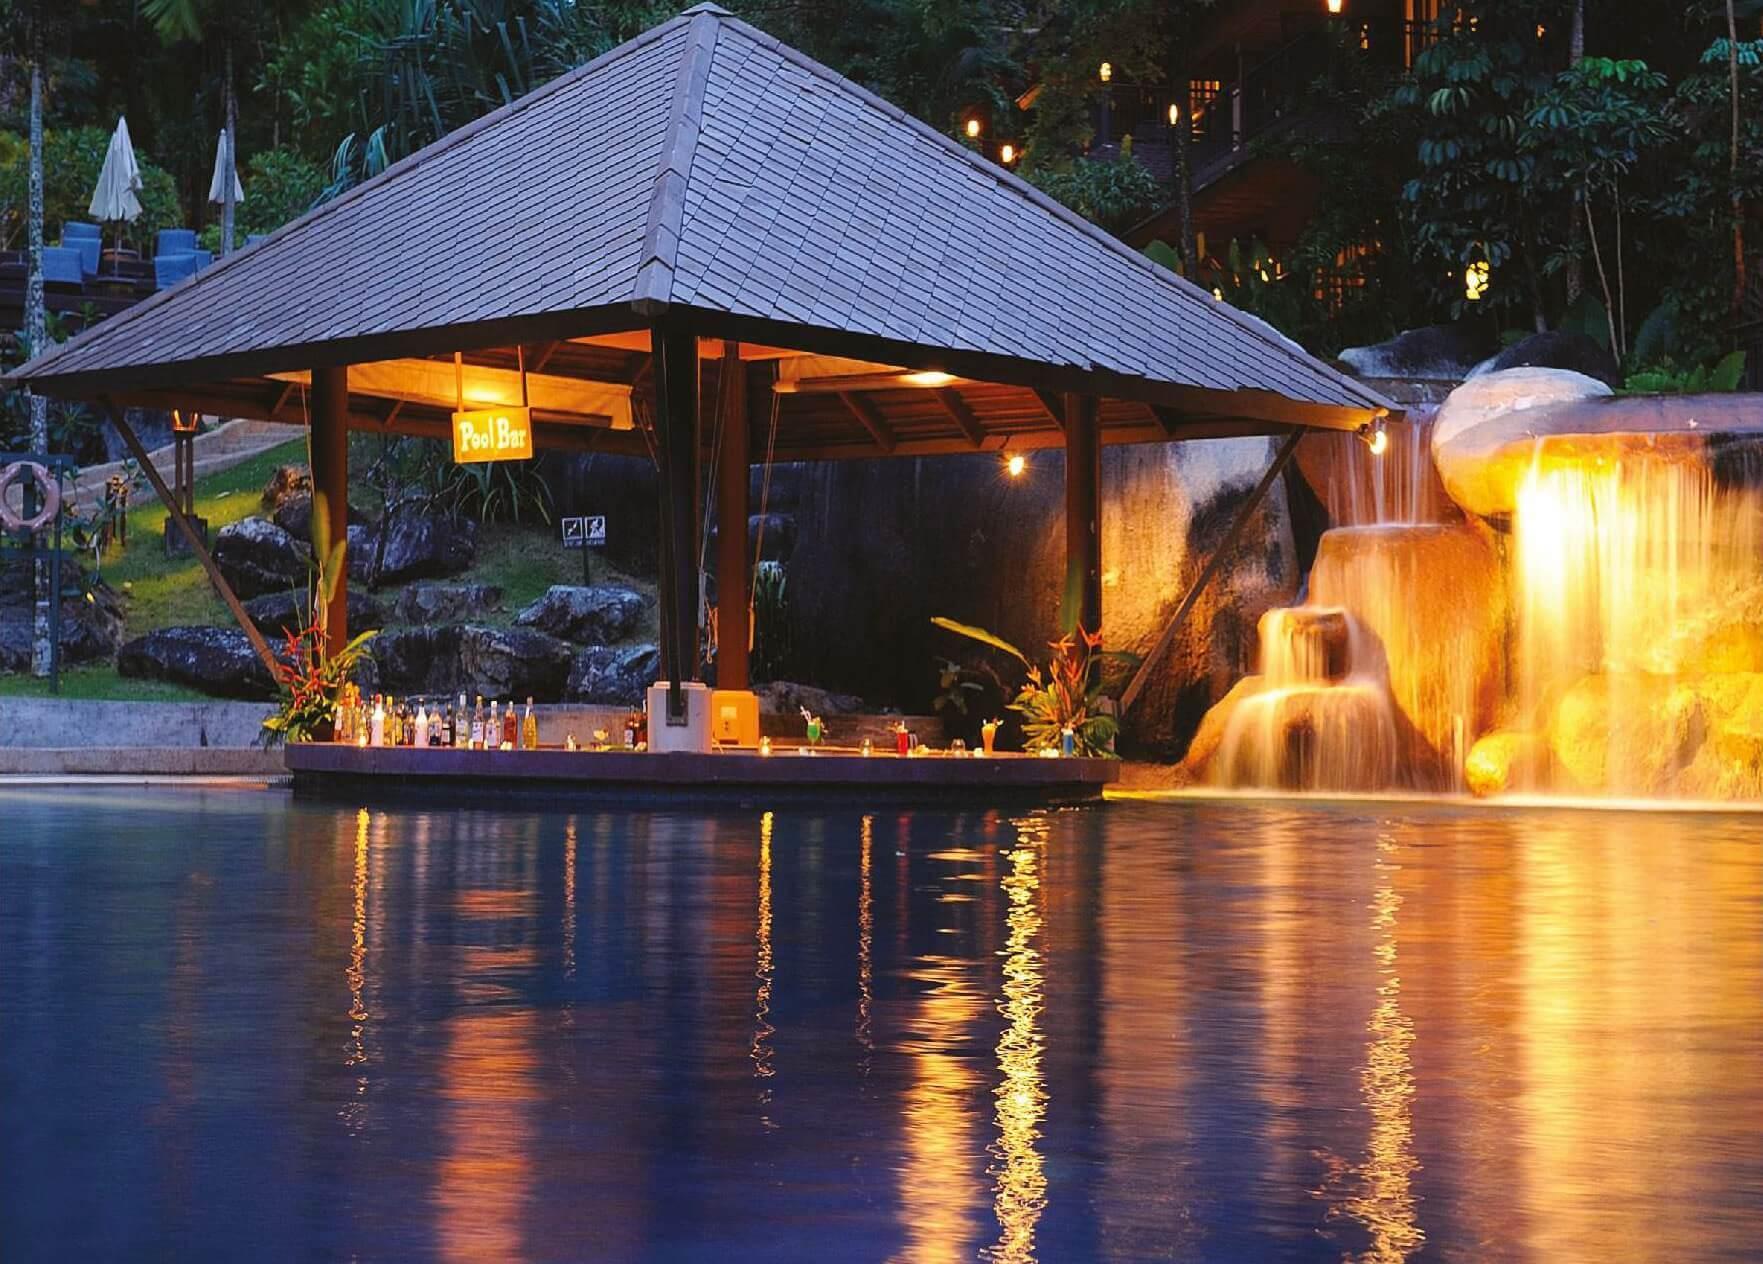 amenities-features-Picture-puravankara-palm-beach-2587791